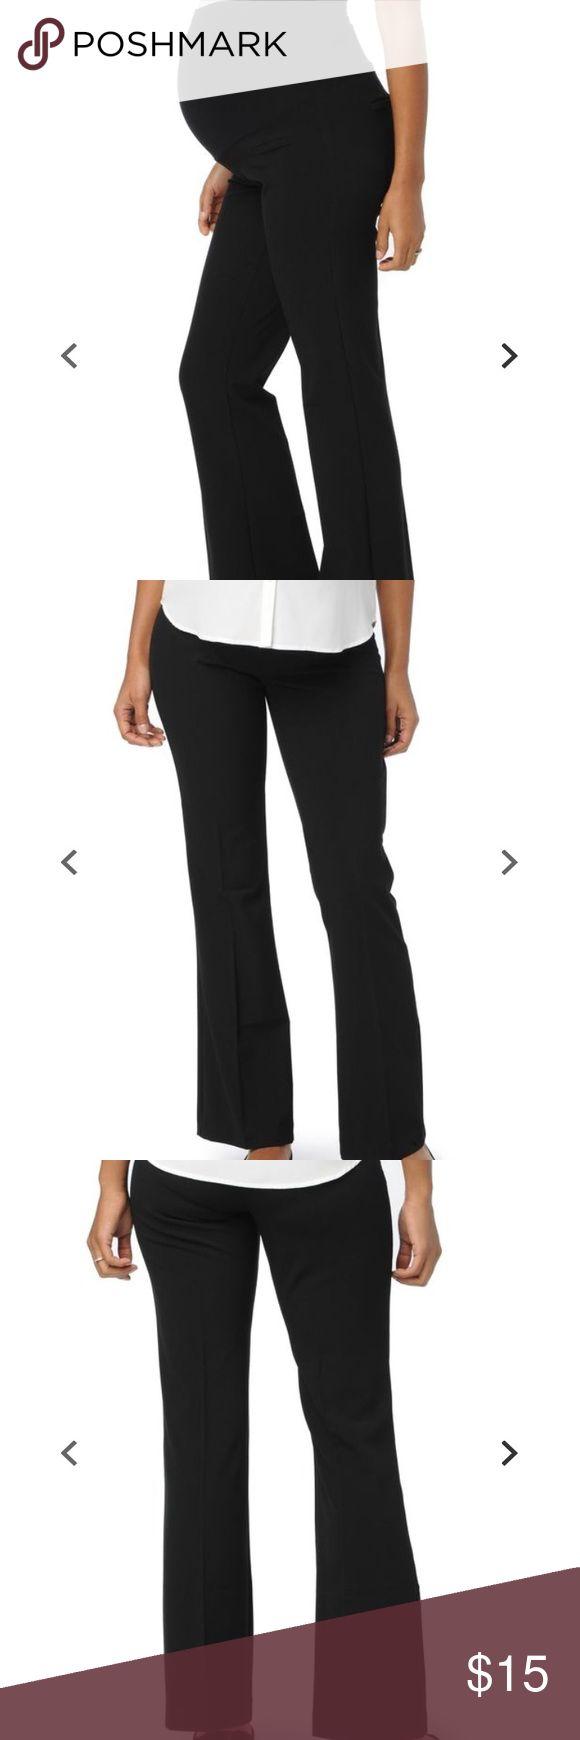 Maternity suit pants Super comfy and stretchy maternity suit pants. Flare cut. Faux pockets. Motherhood Maternity Pants